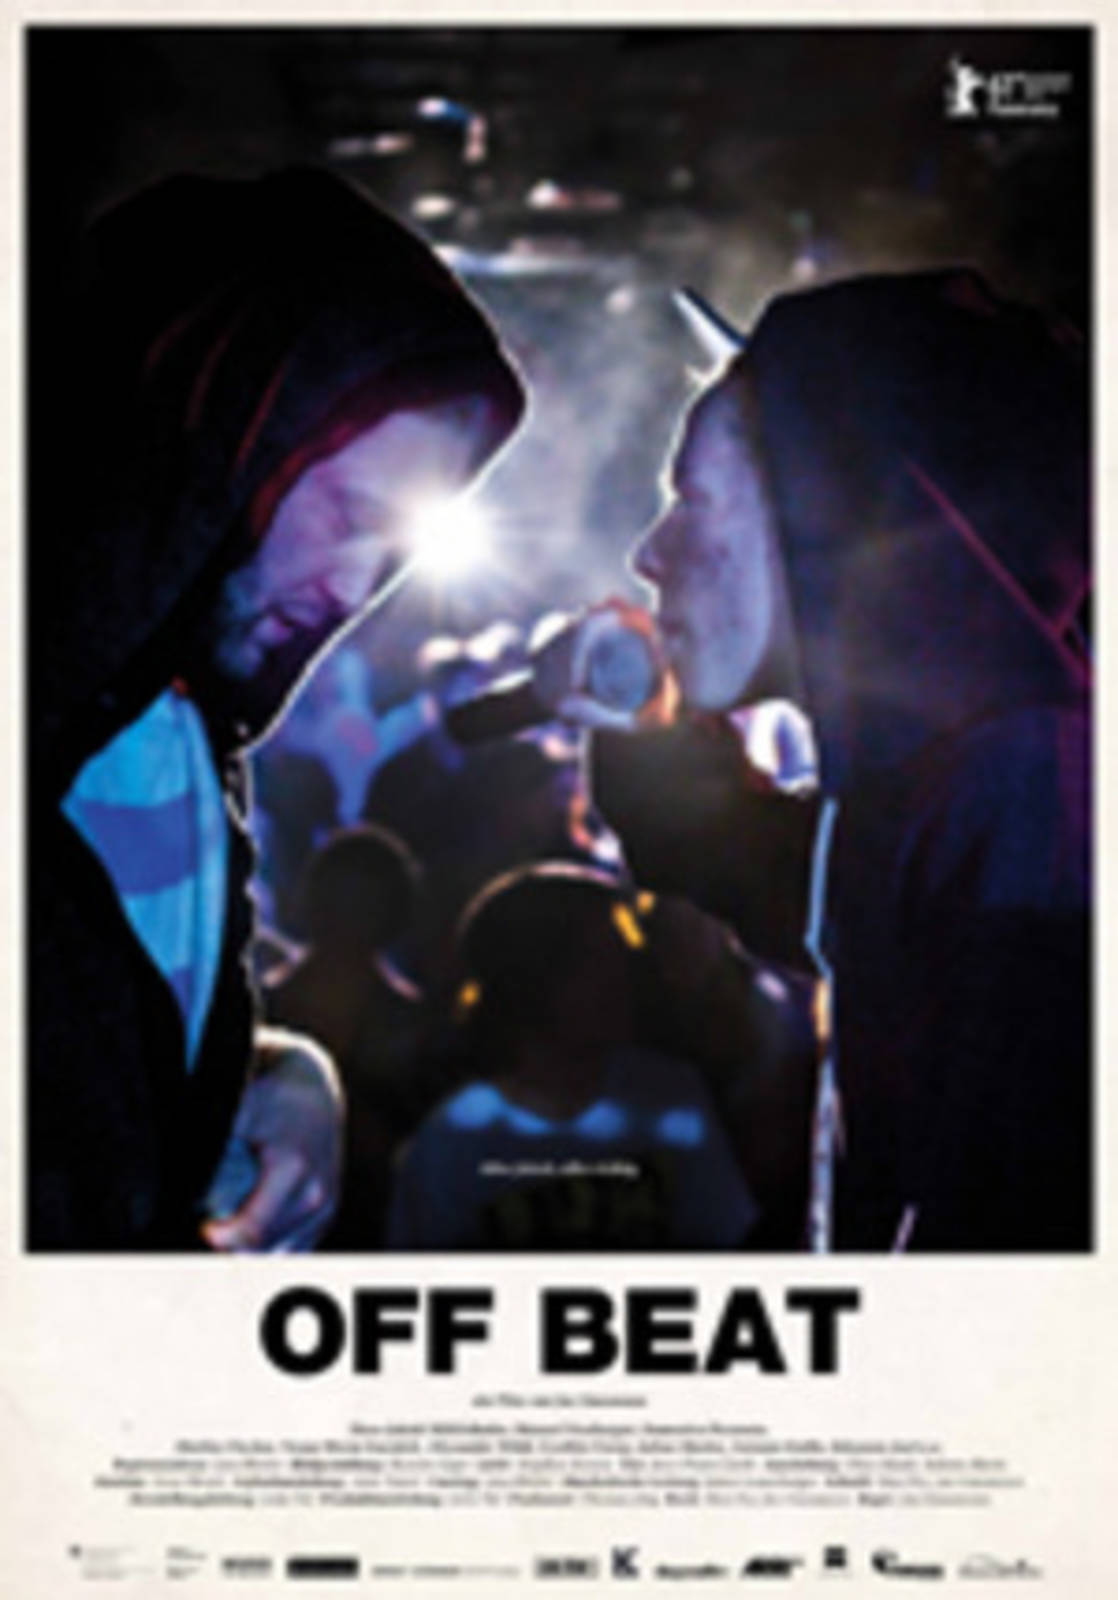 film off beat cineman